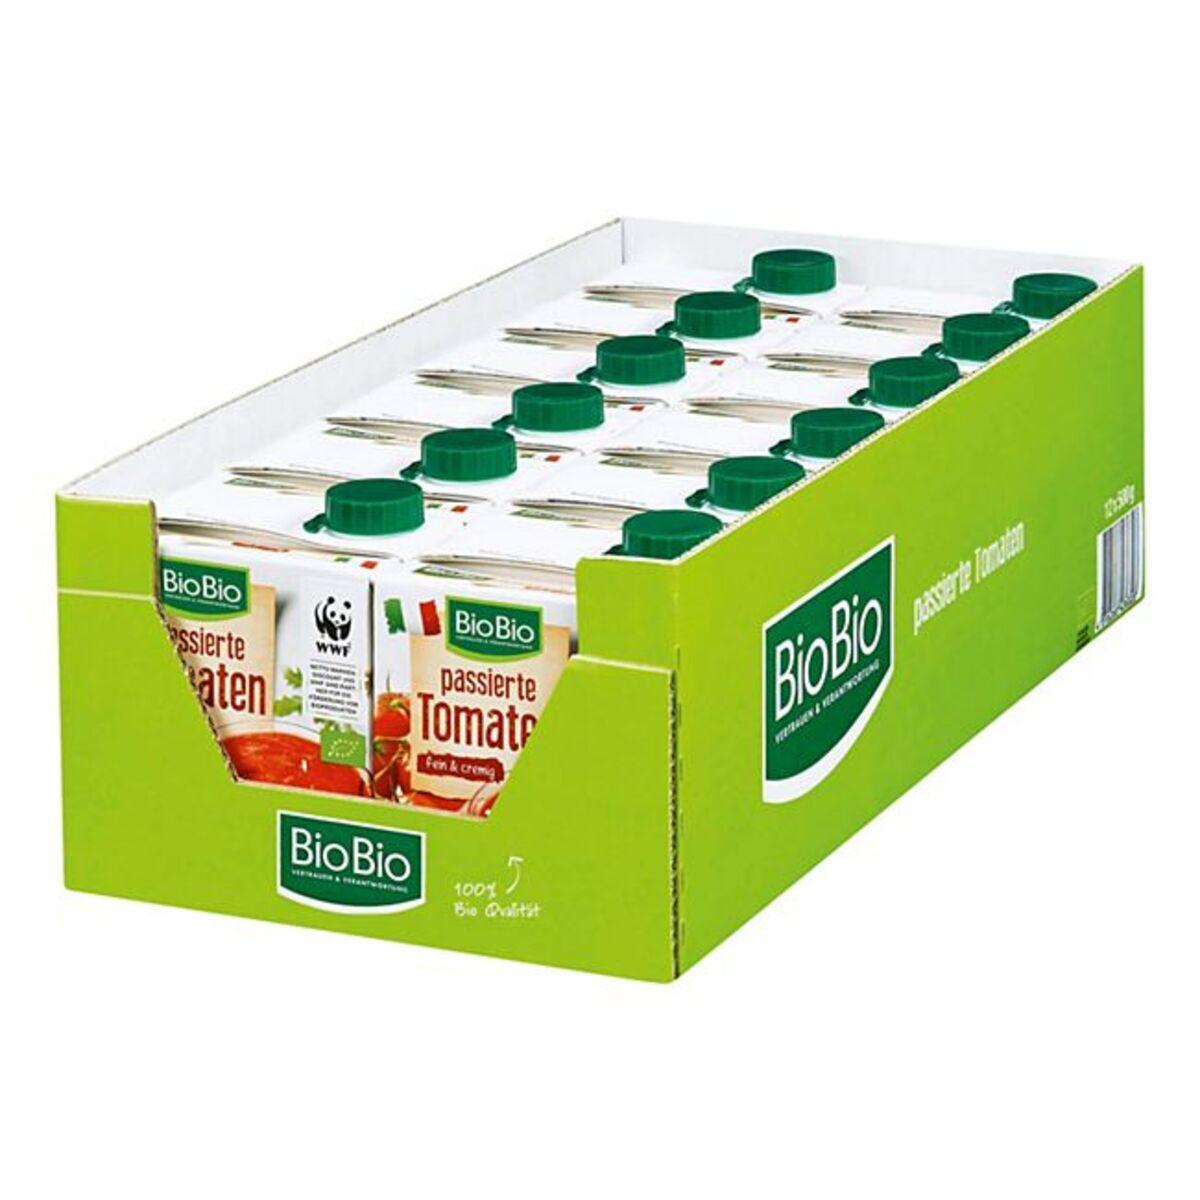 Bild 1 von BioBio Passierte Tomaten 500 g, 12er Pack